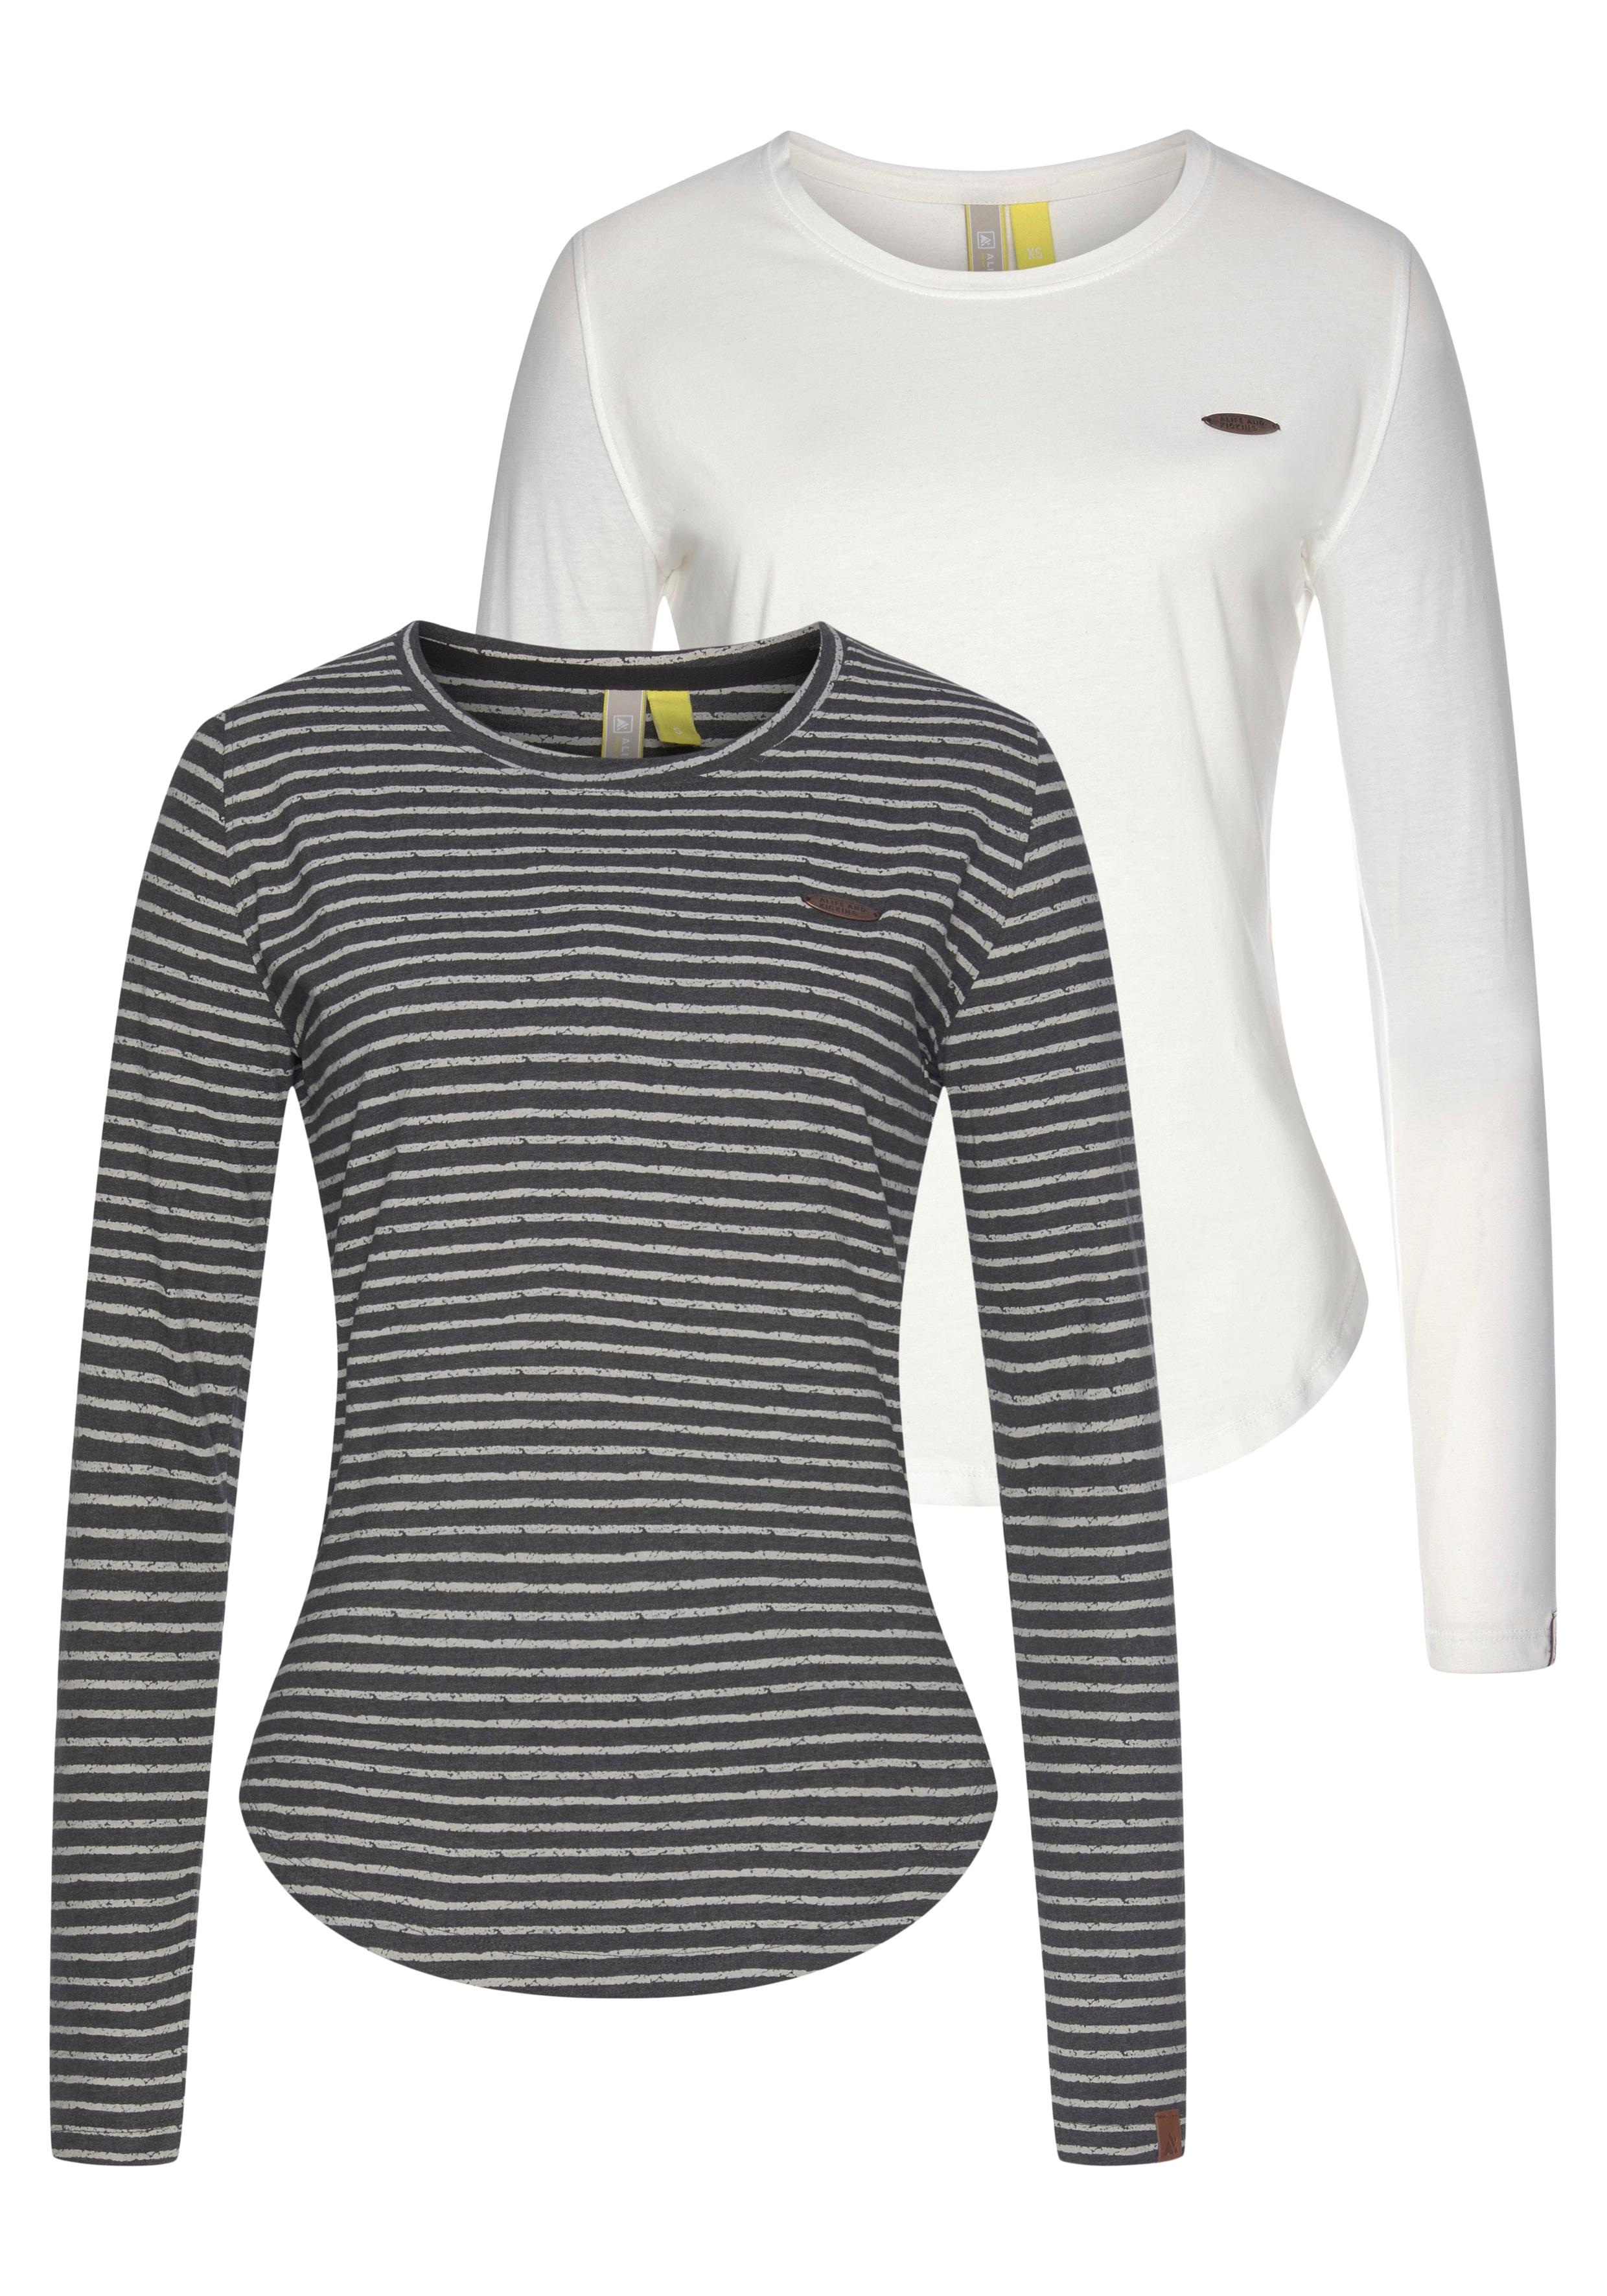 alife & kickin -  T-Shirt LeaAK, modisches Longsleeve mit Bogensaum& Rundhalsausschnitt